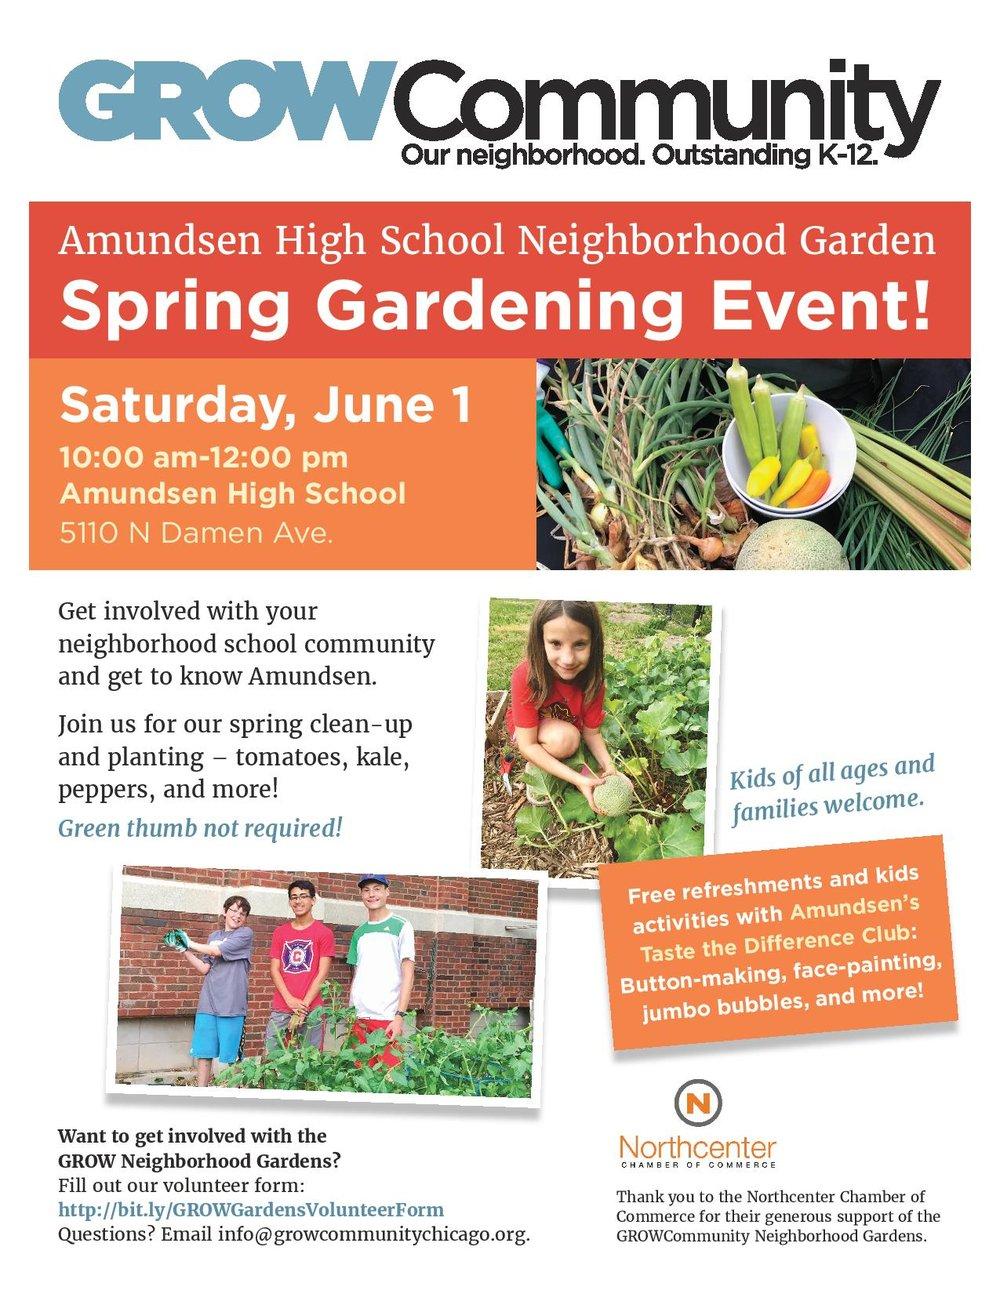 GC_GardenFlyer_Spring_040919_2-page-001.jpg